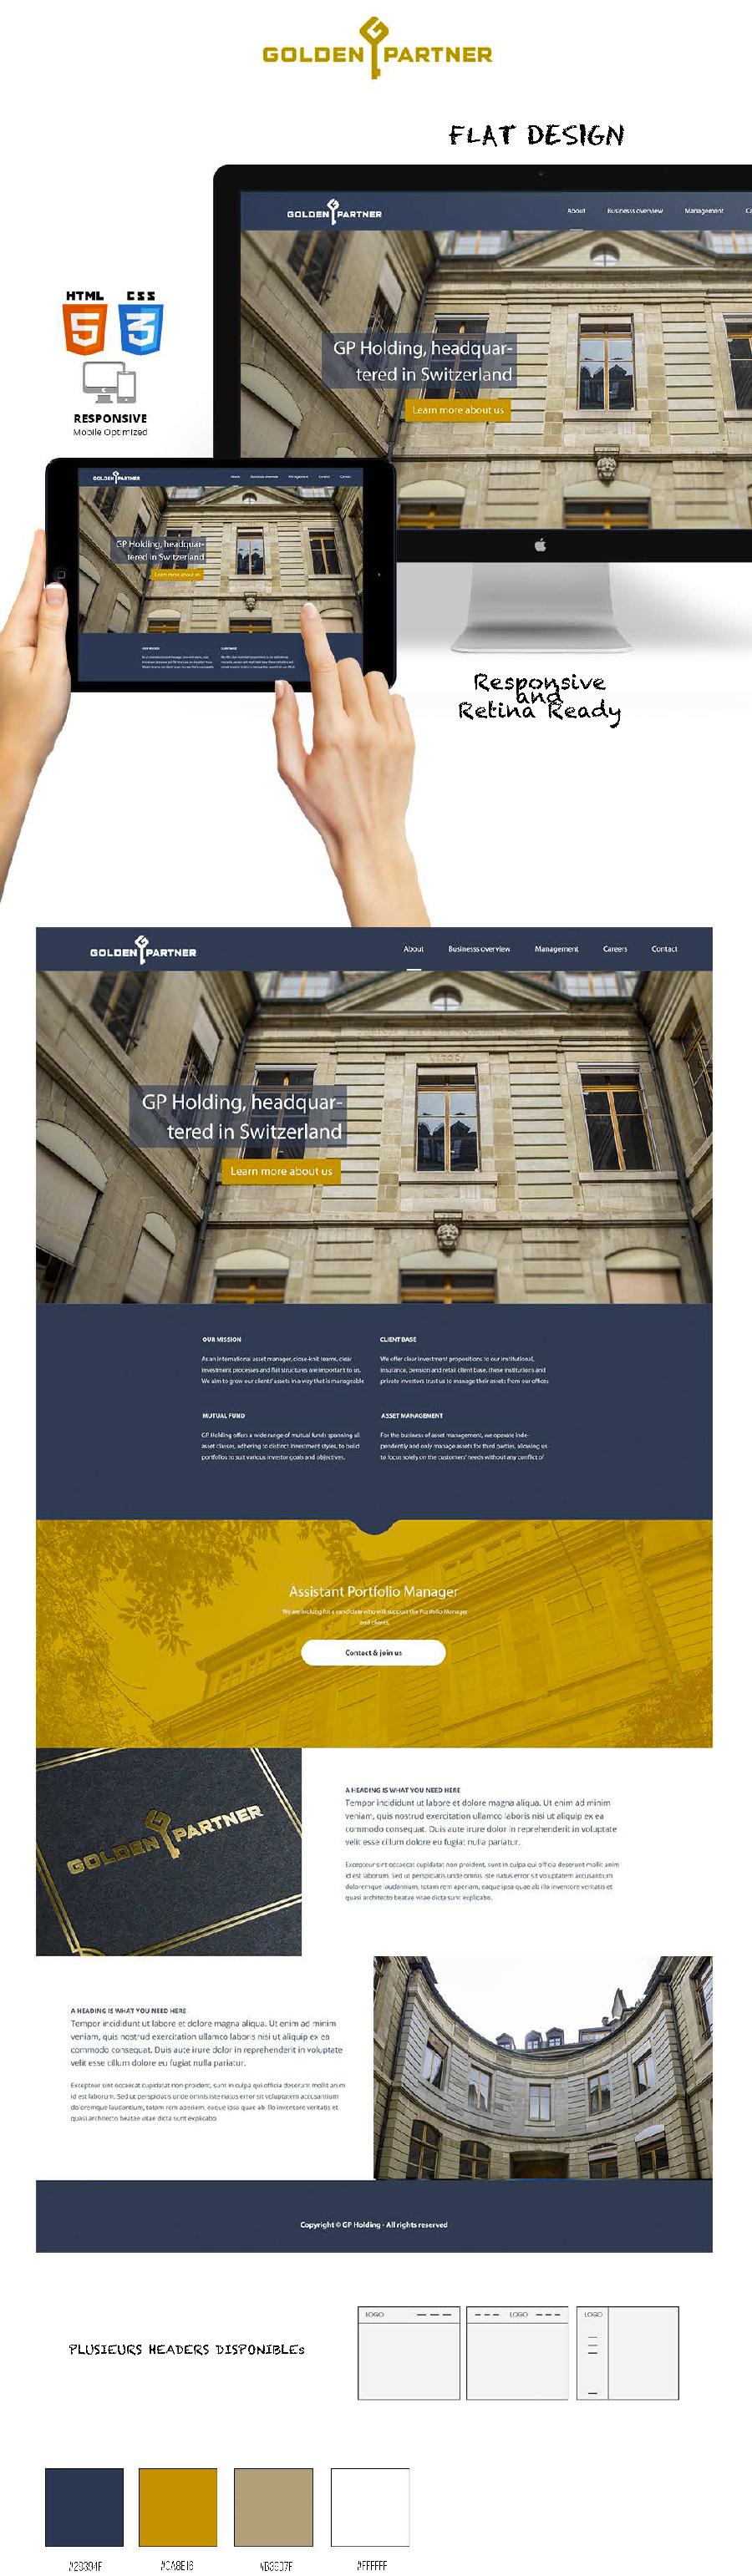 Proposition-design2-golden-miu2